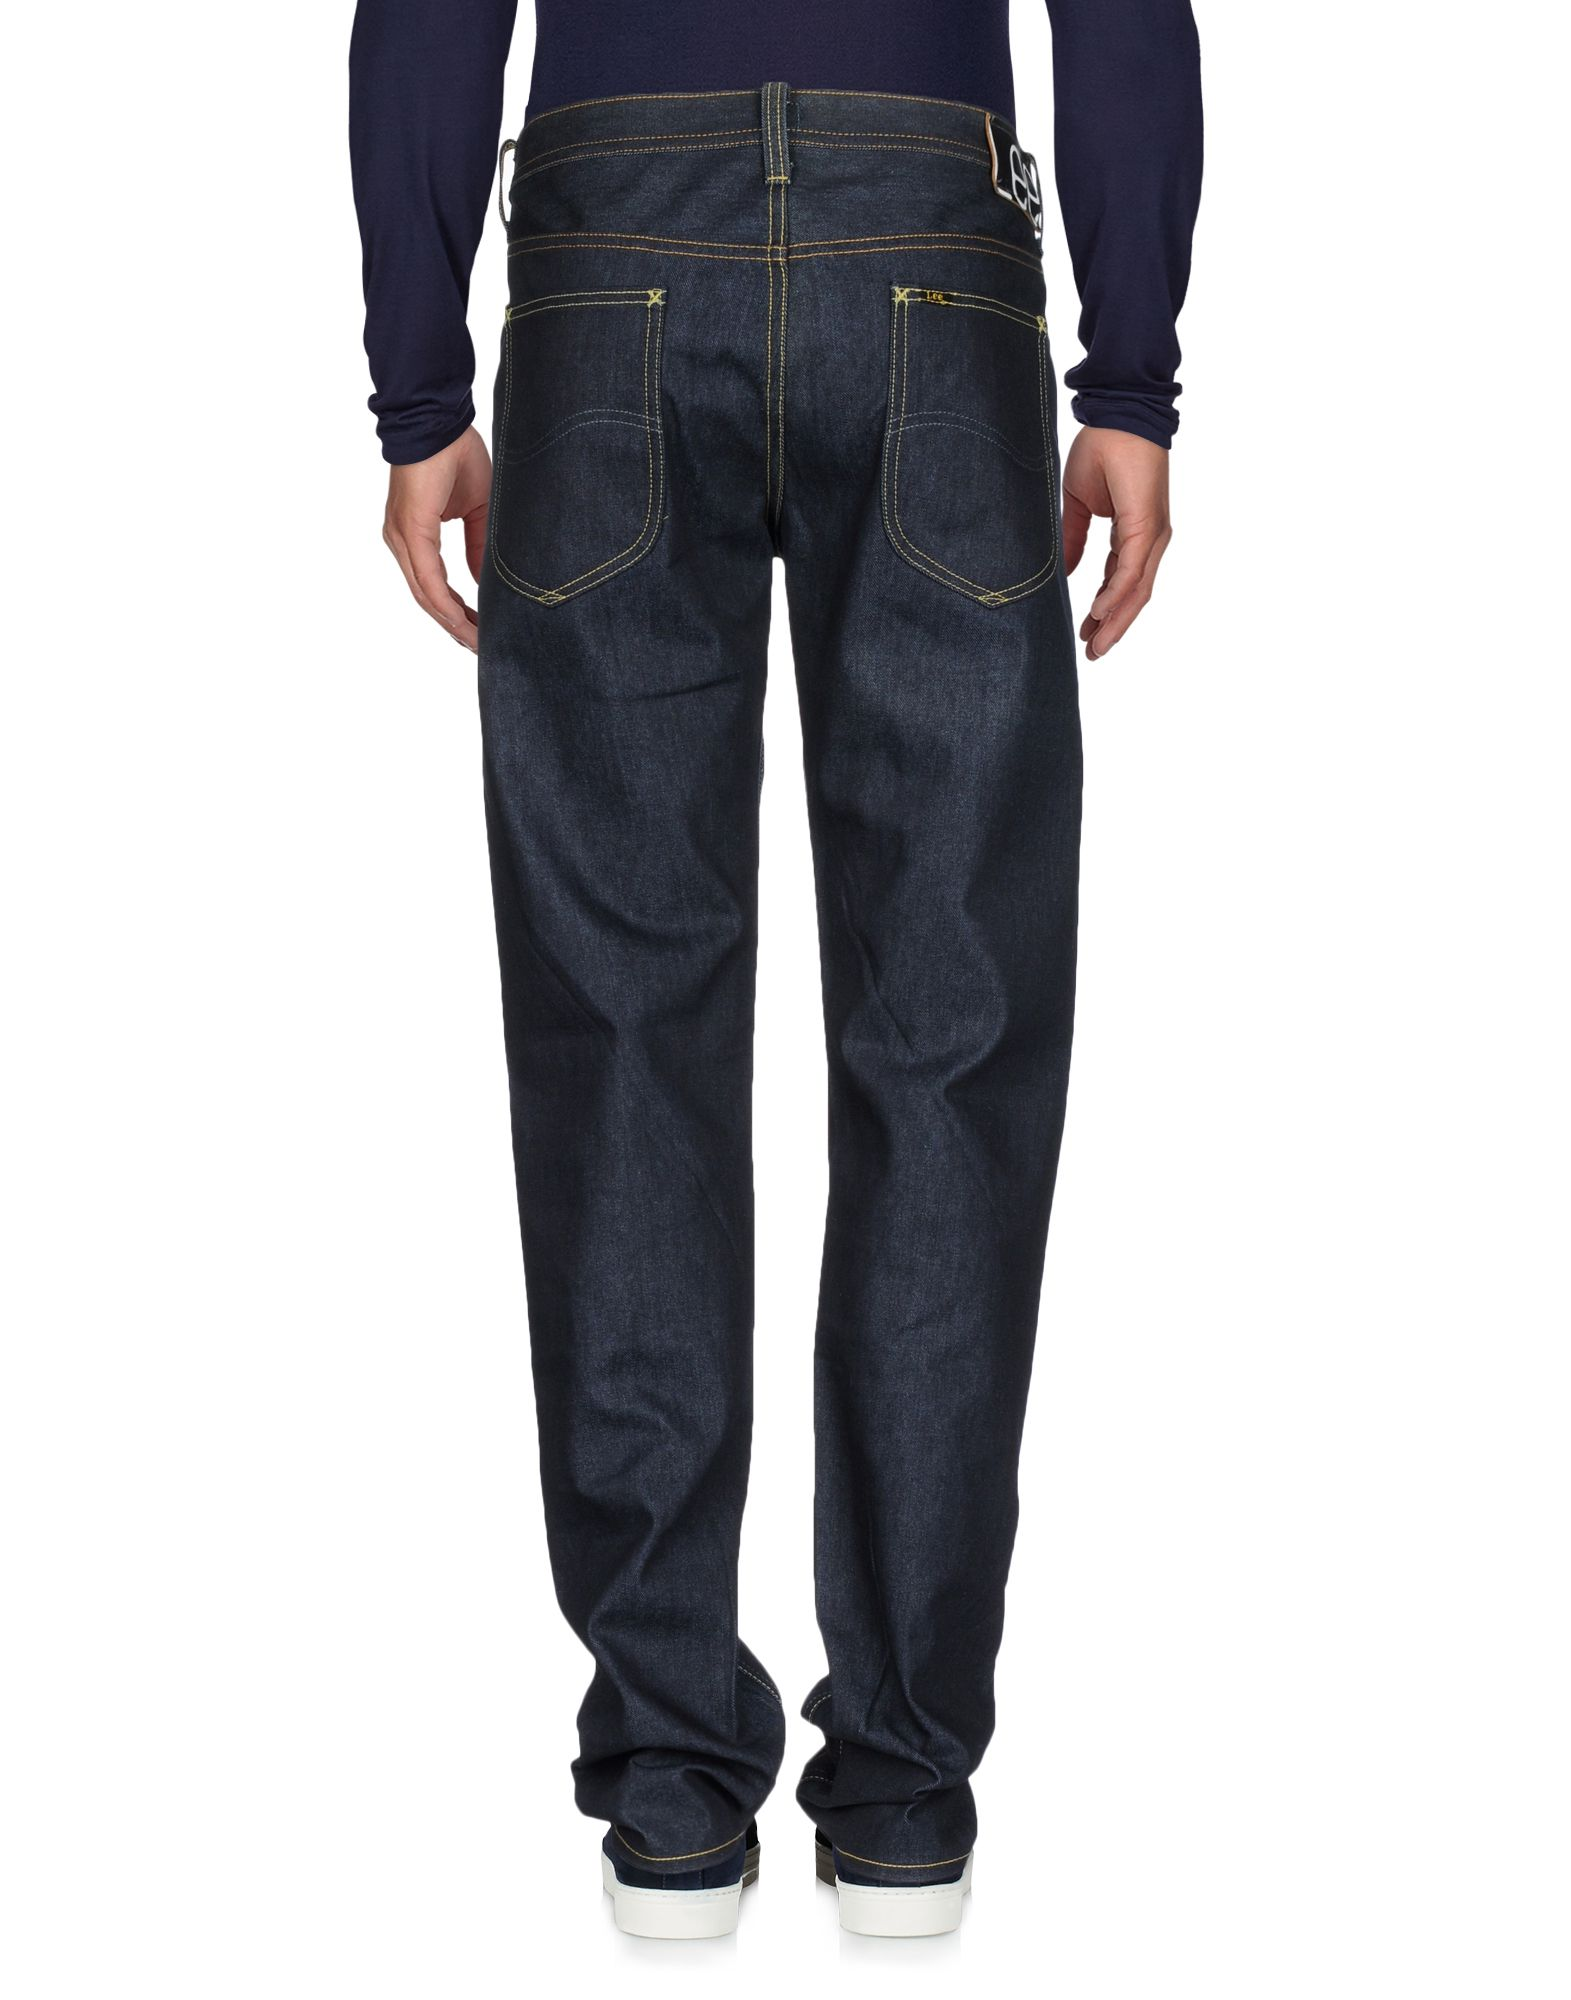 Pantaloni Jeans Lee 101 Uomo - 42668313GD 42668313GD - 5348a7